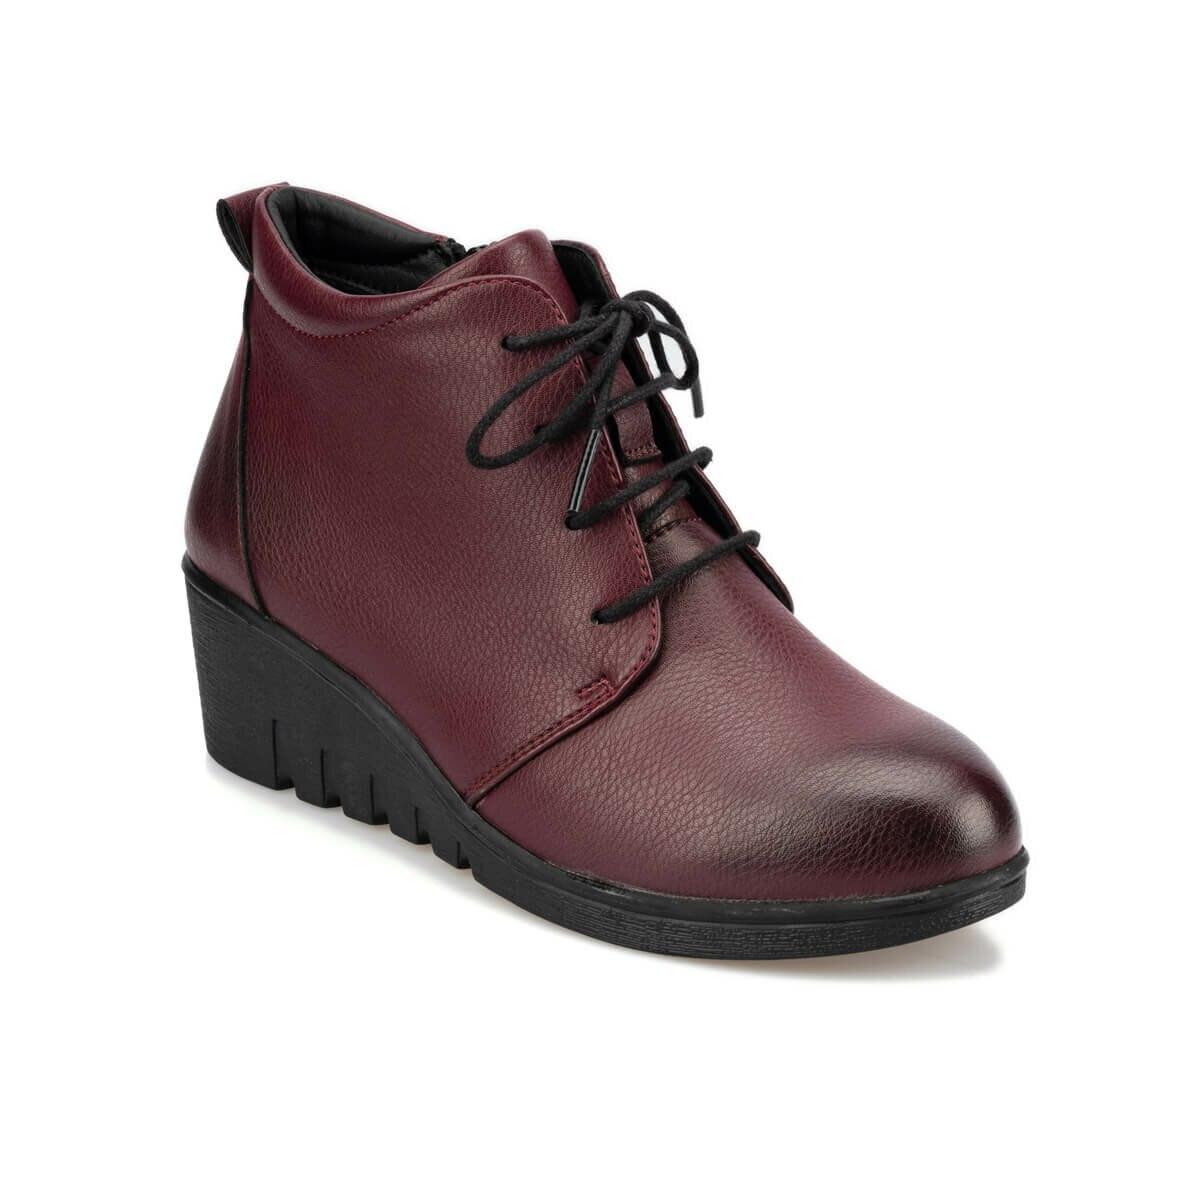 FLO 92.151090.Z حذاء بوت بولاريس نسائي عنابي اللون